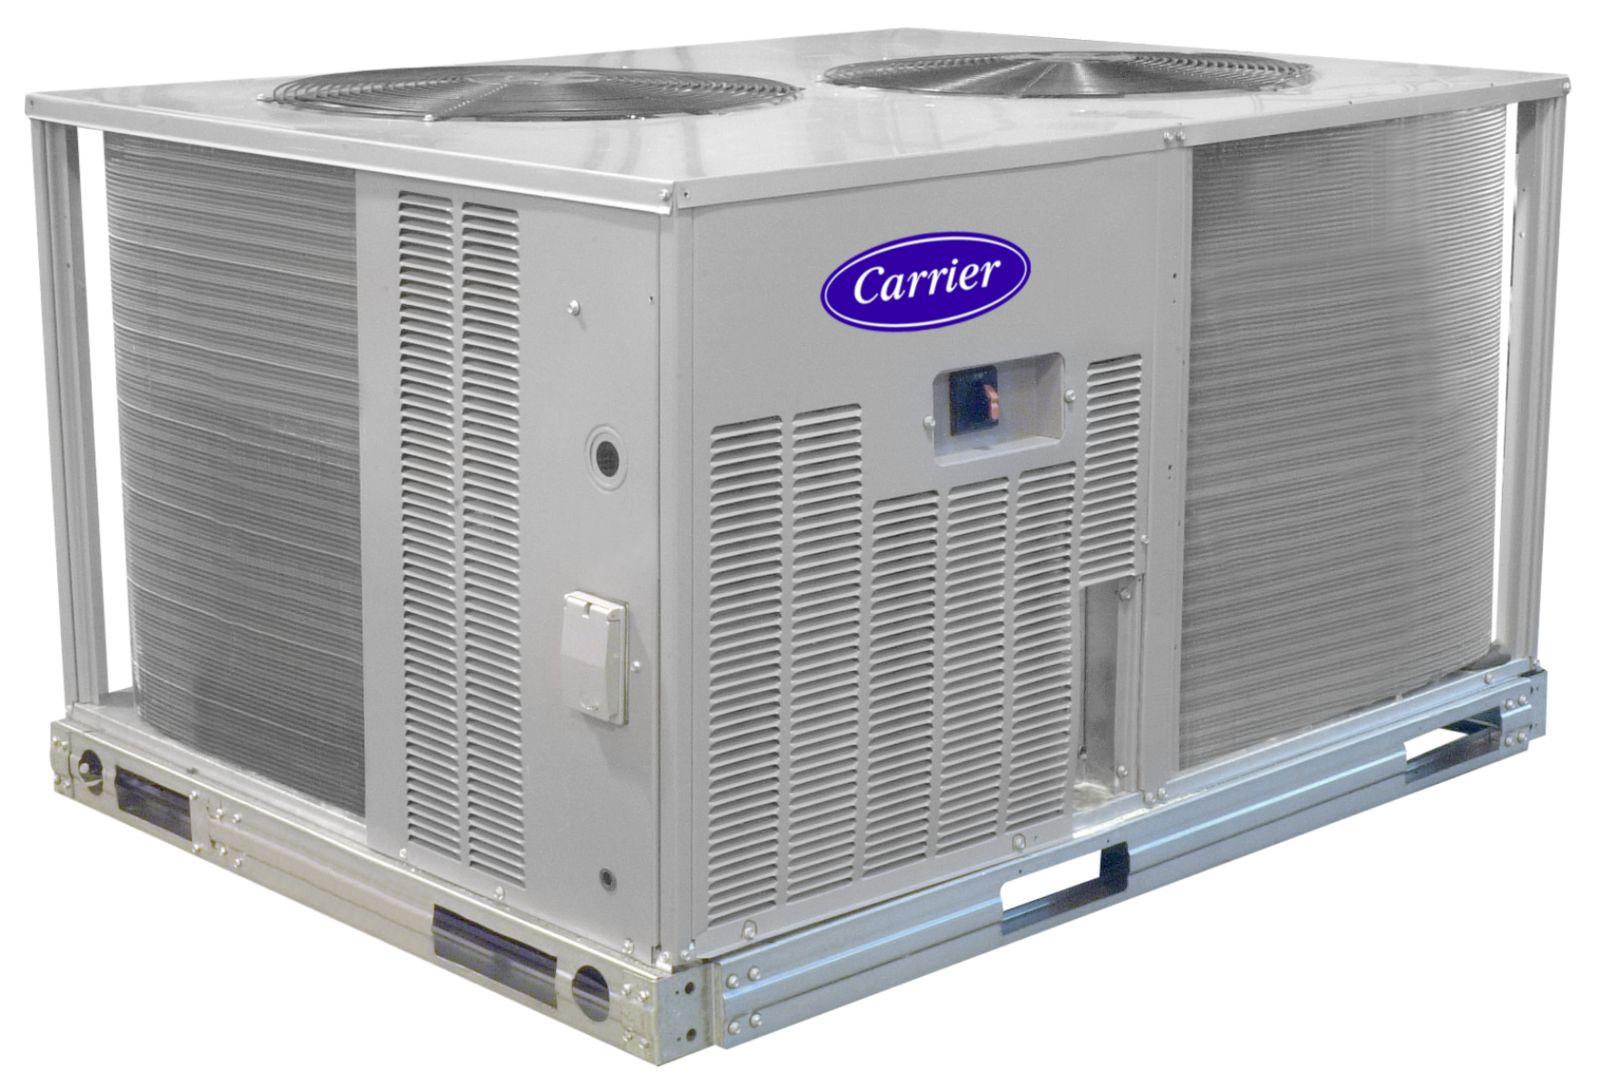 Ge Ptac Heat Pump Carrier 40ruqa08a2a6 0a0a0 Heat Pump Commercial Air Handlers